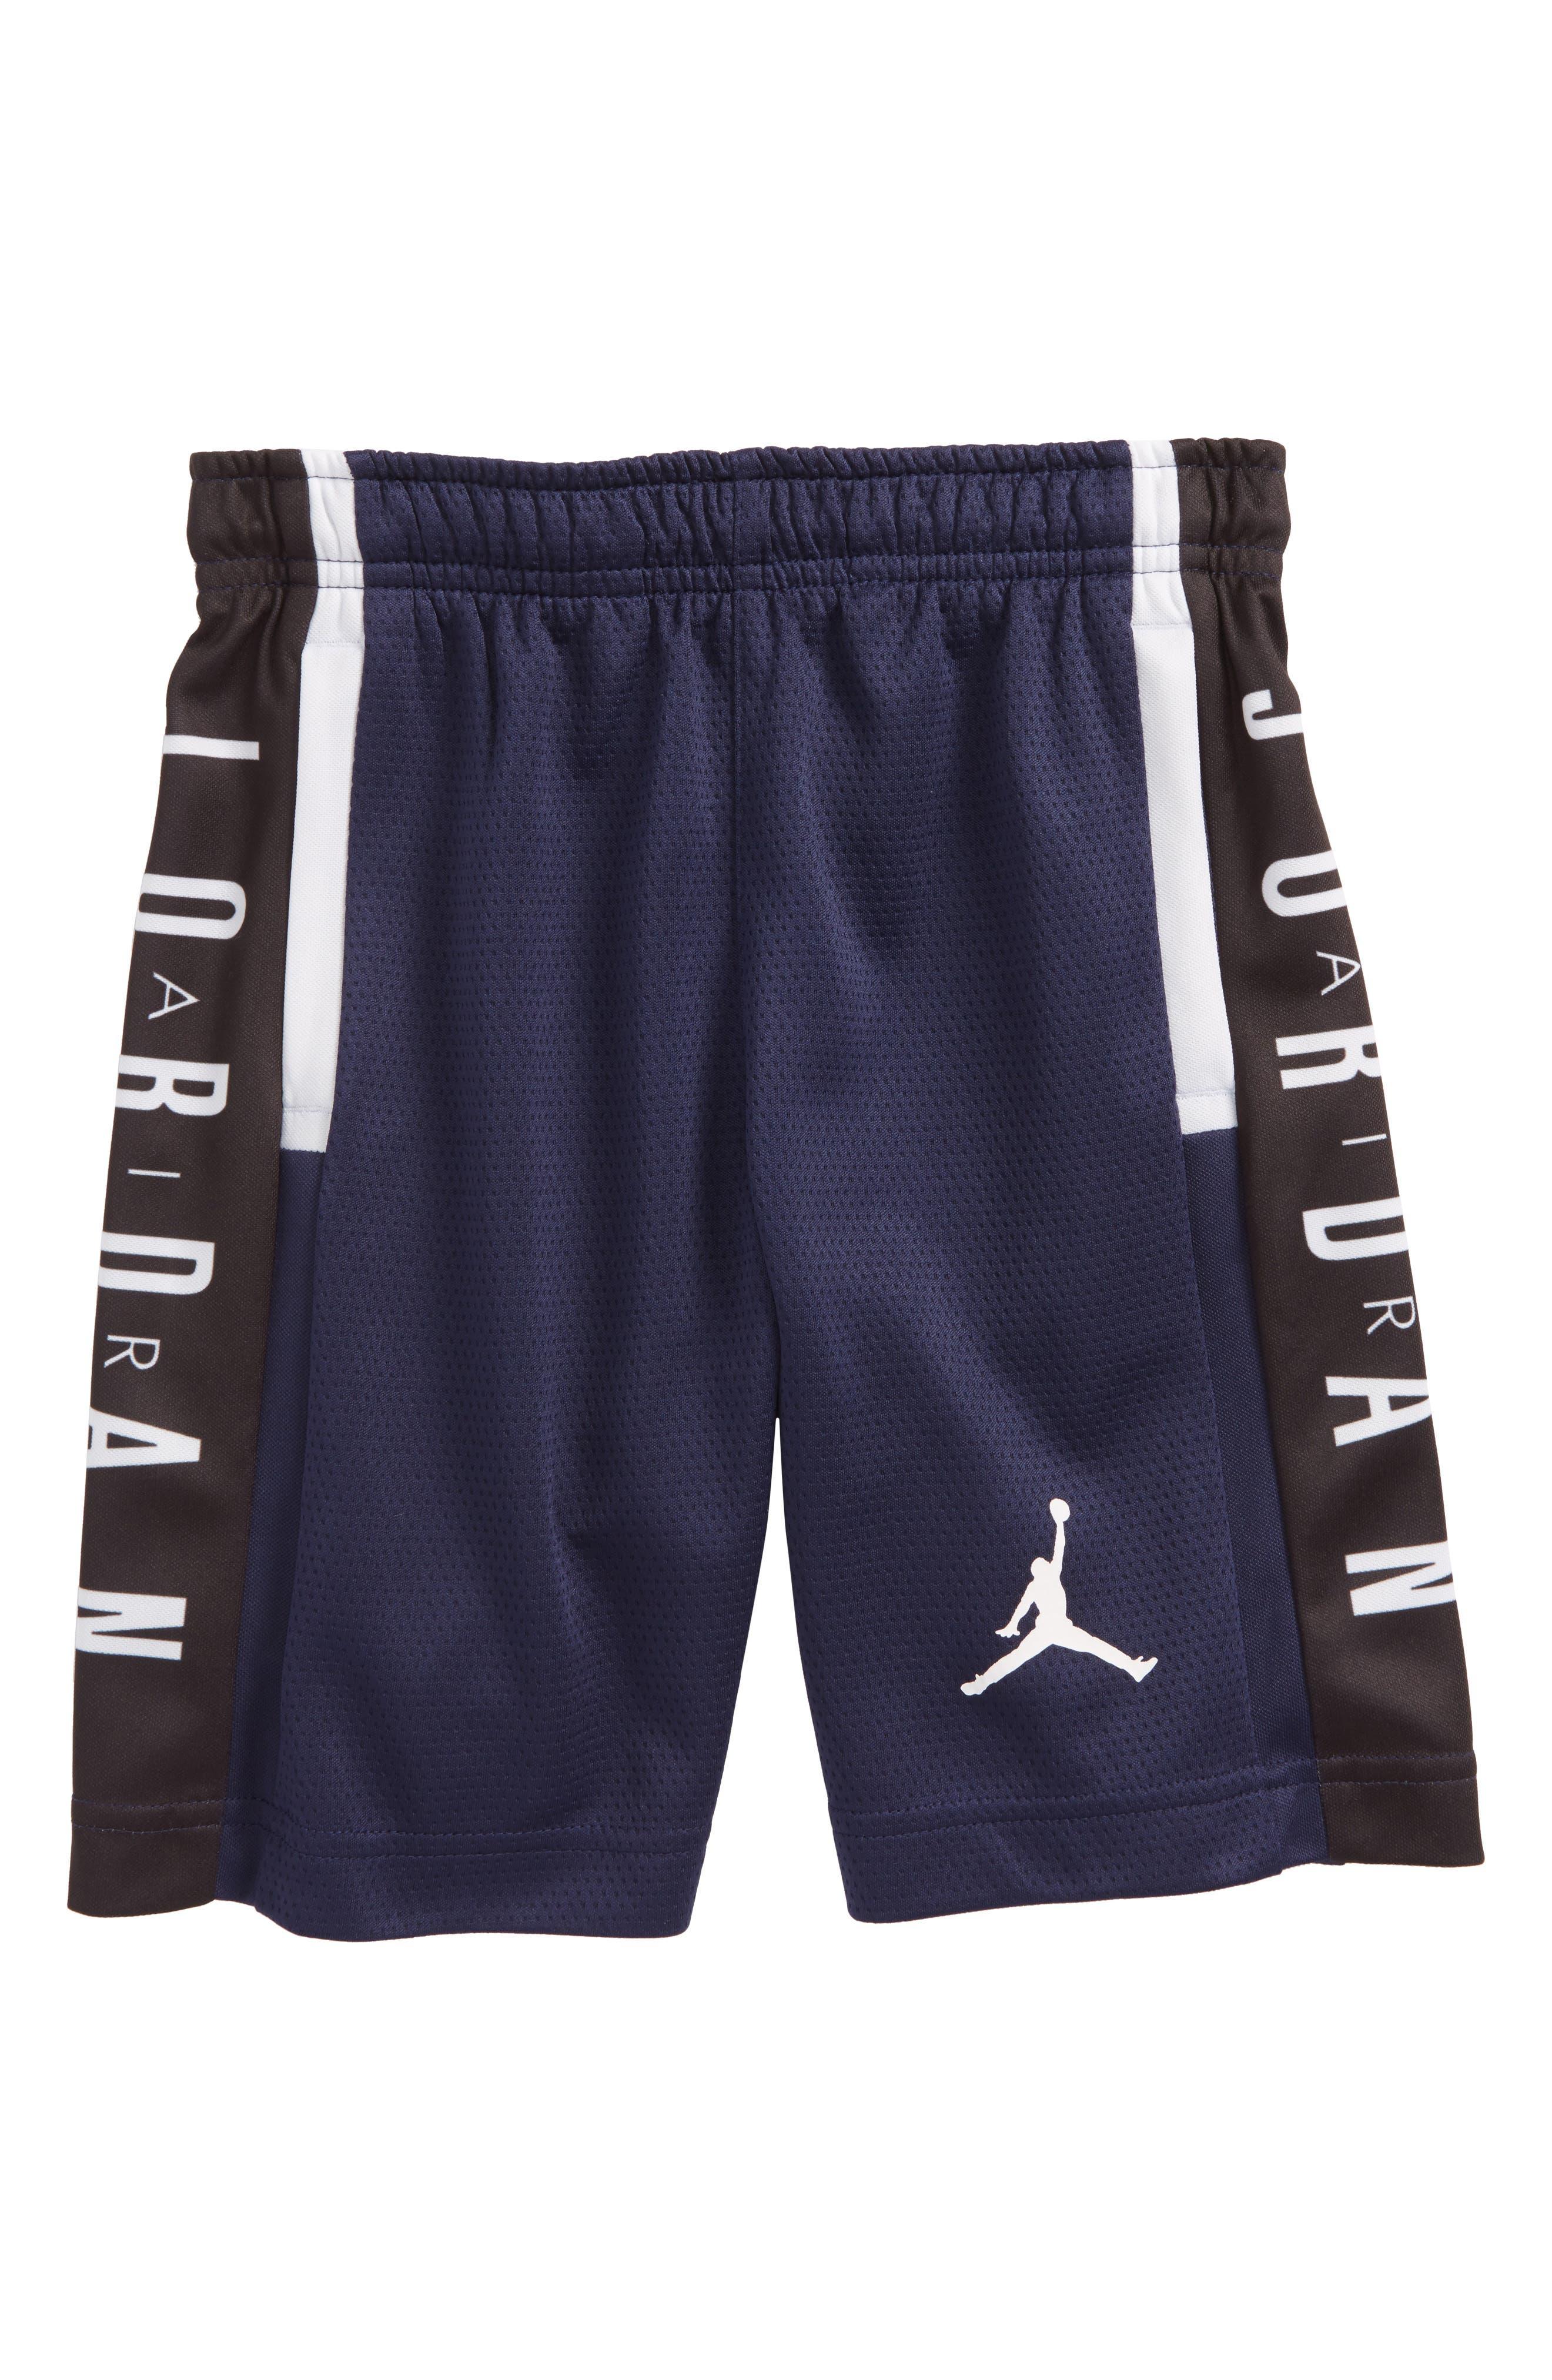 Jordan Rise Graphic Shorts,                         Main,                         color, Midnight Navy